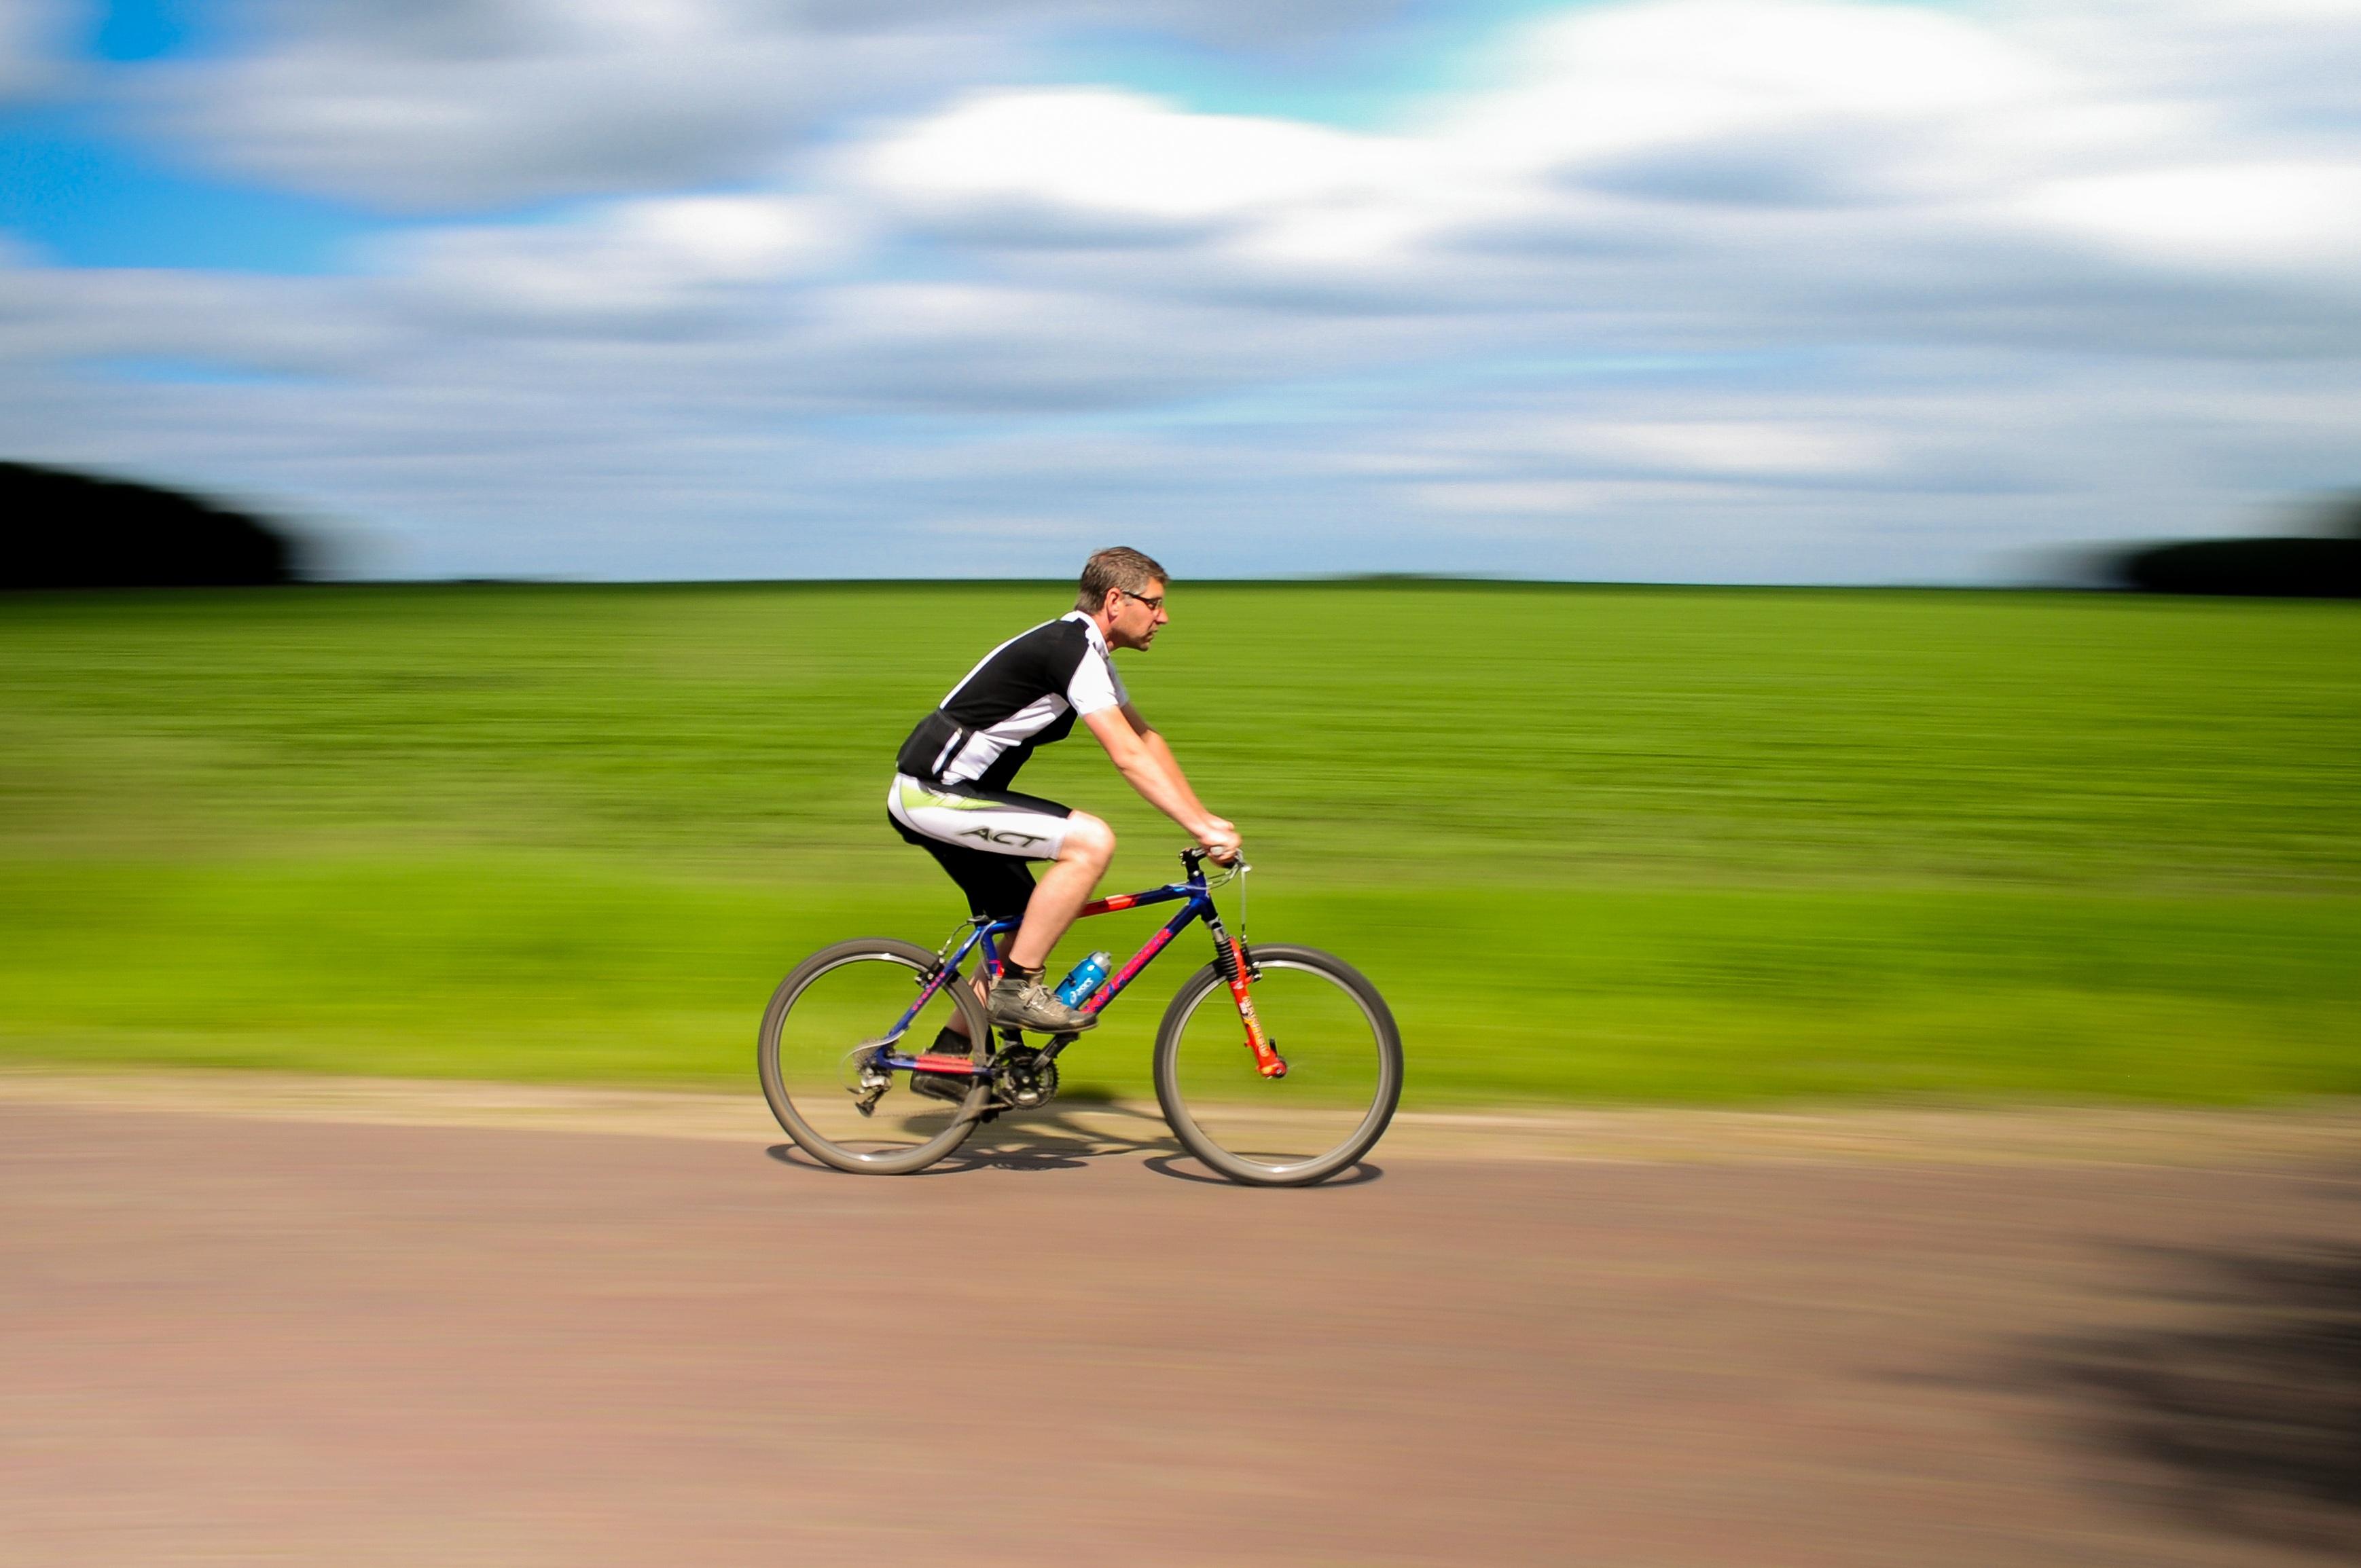 Cycle ride photo